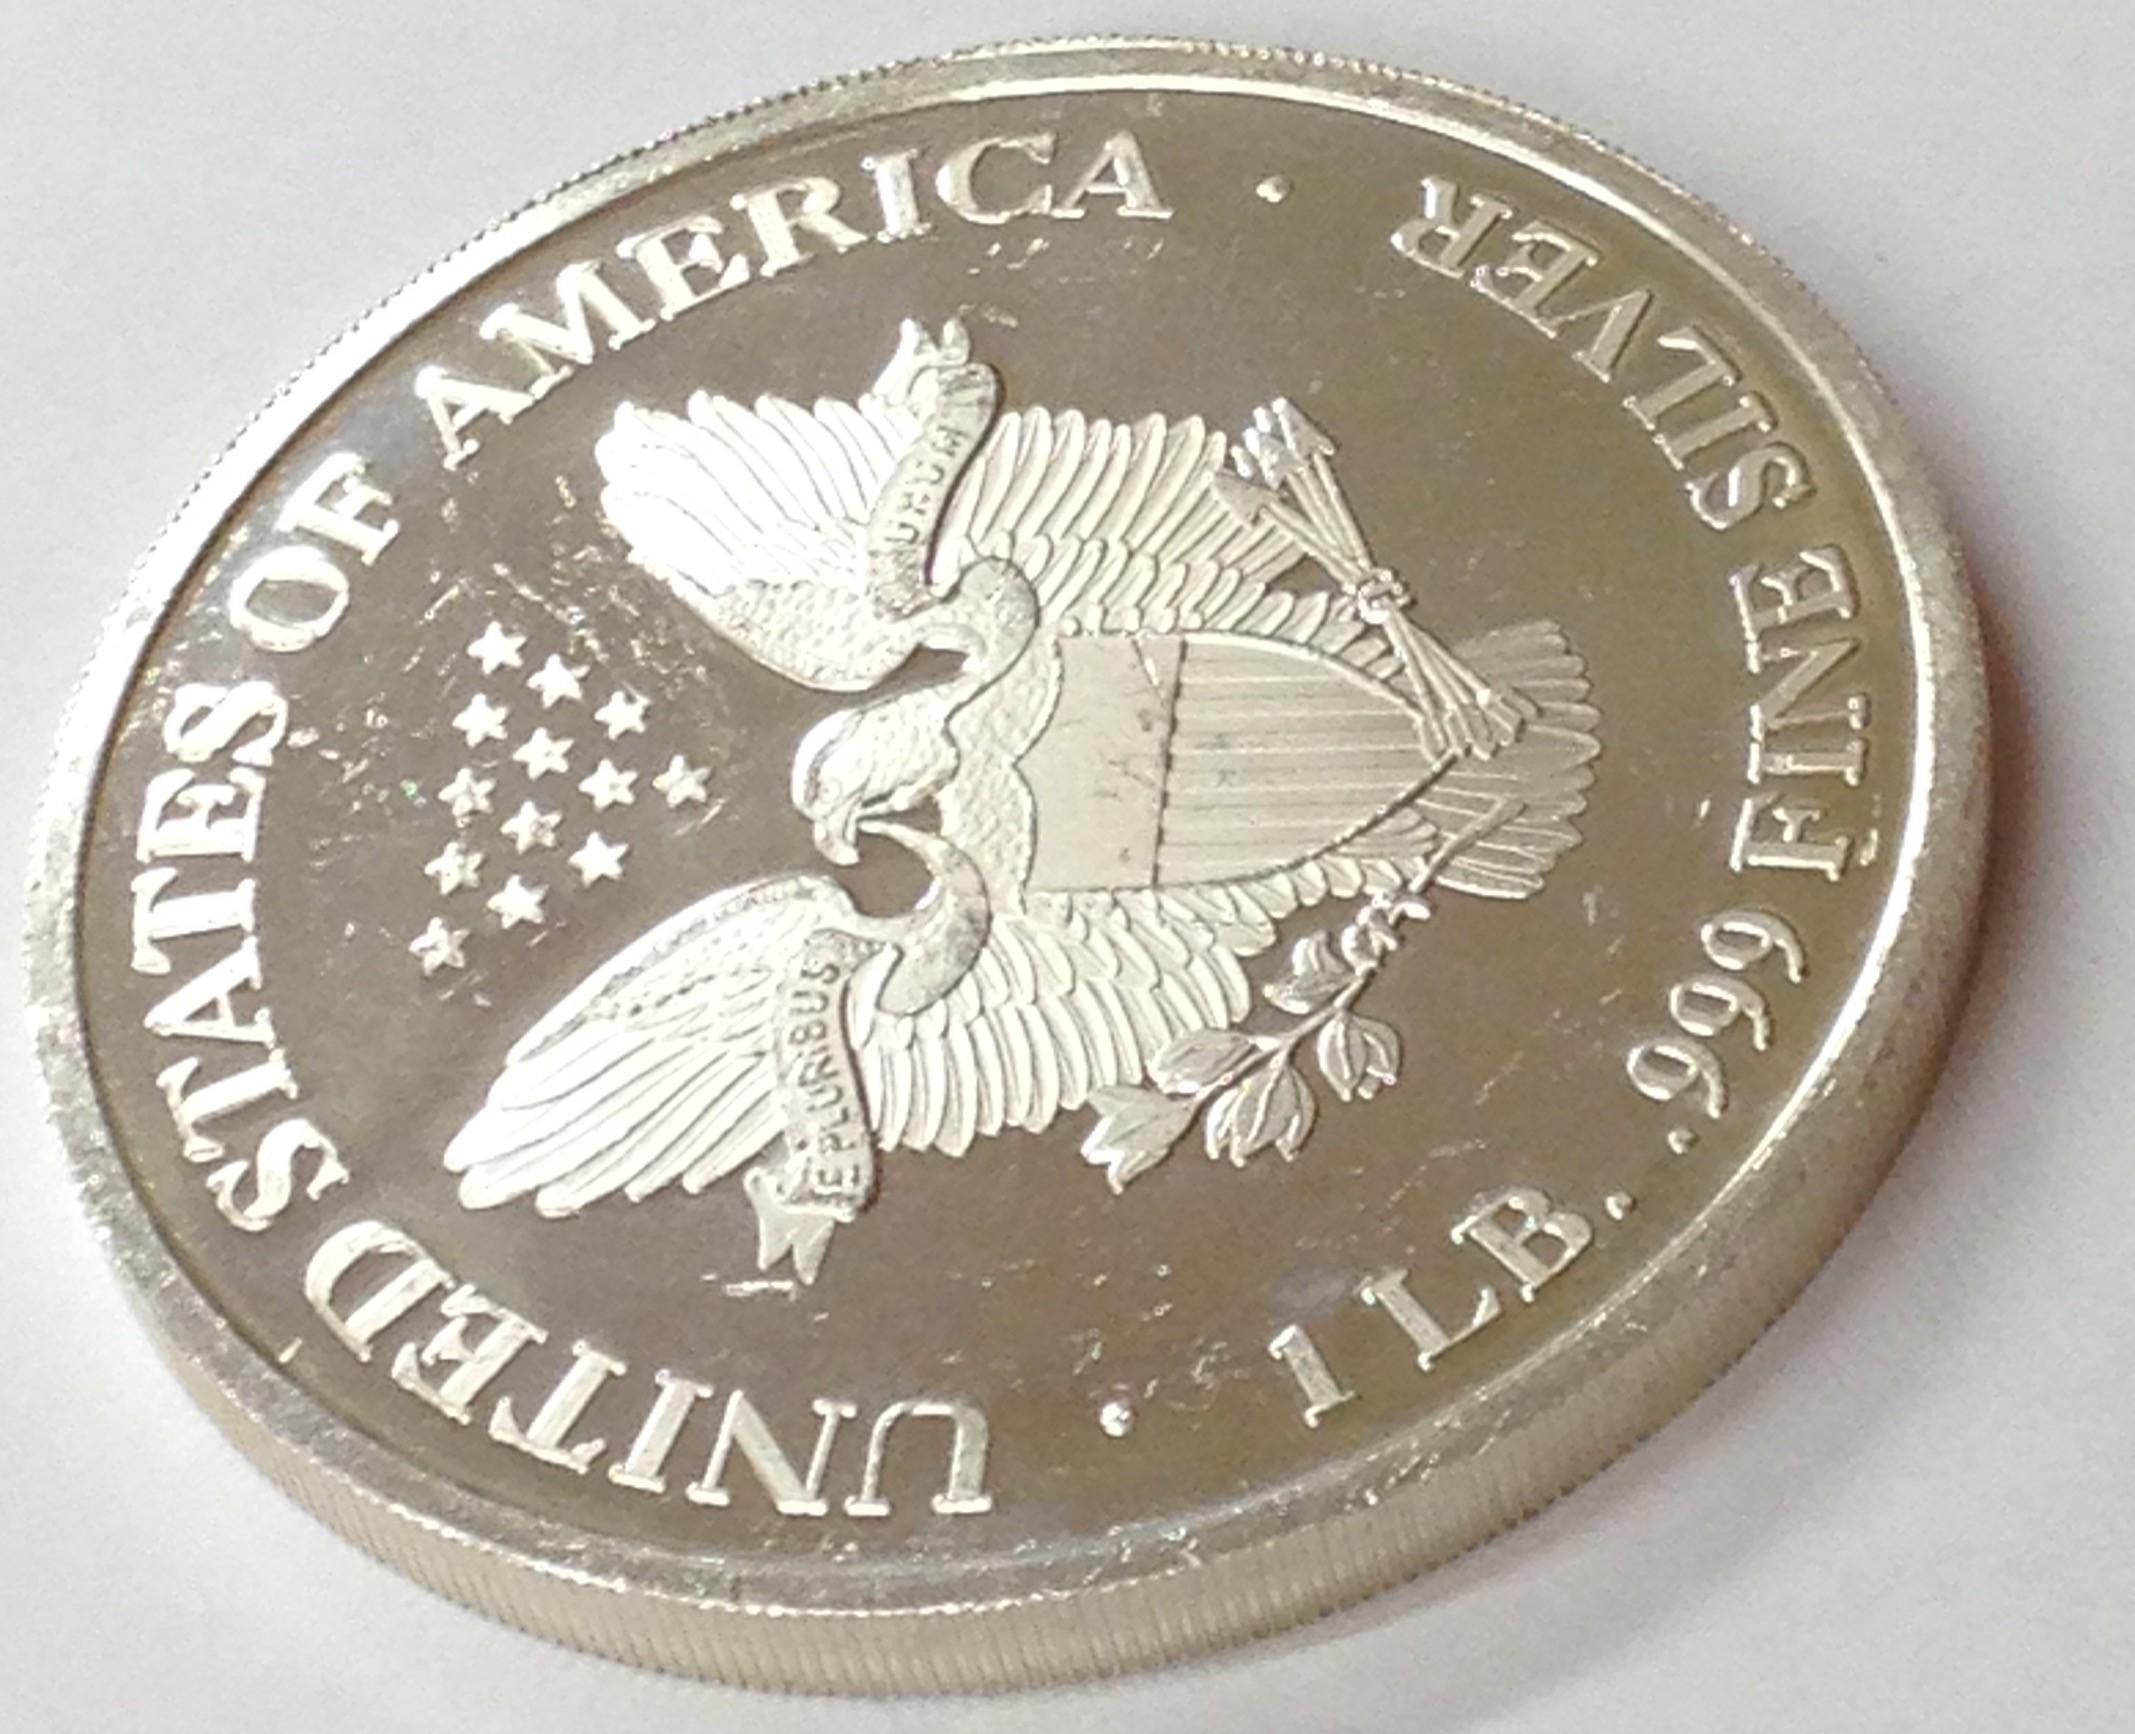 2003 1 Lb Proof American Silver Eagle Round 11 97 Troy Oz Of 999 Fine Silver Ebay